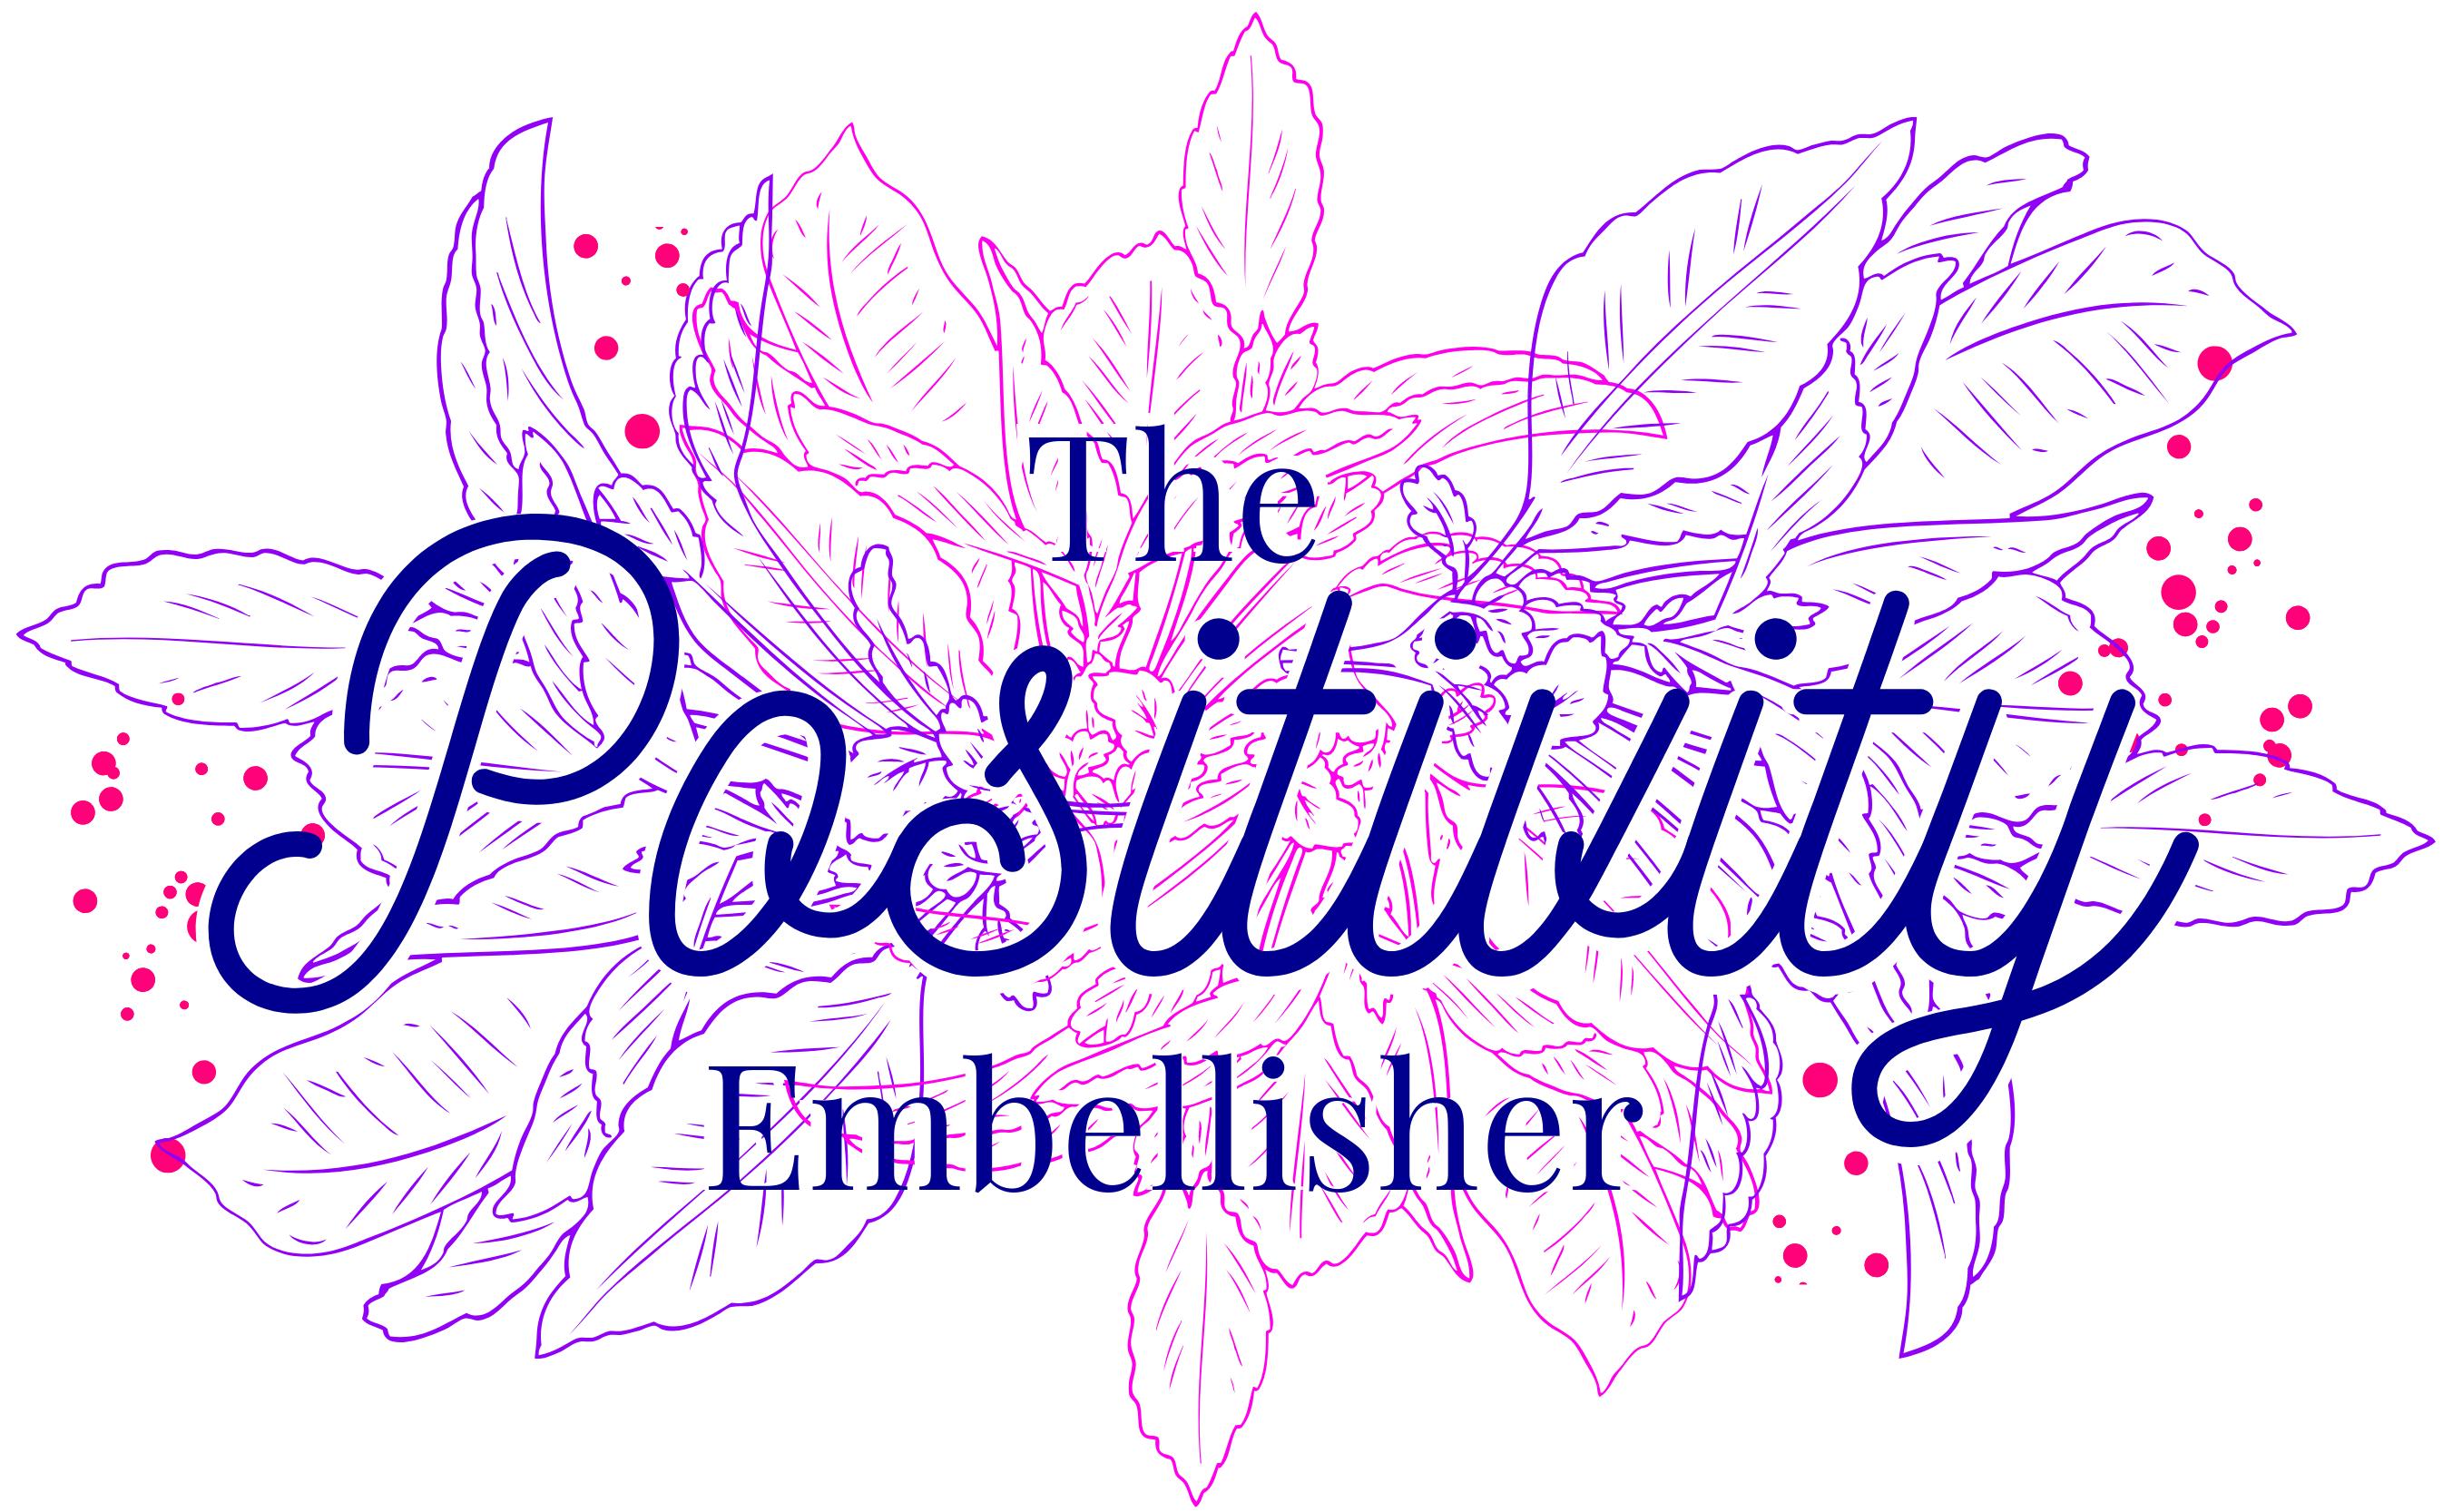 The Positivity Embellisher